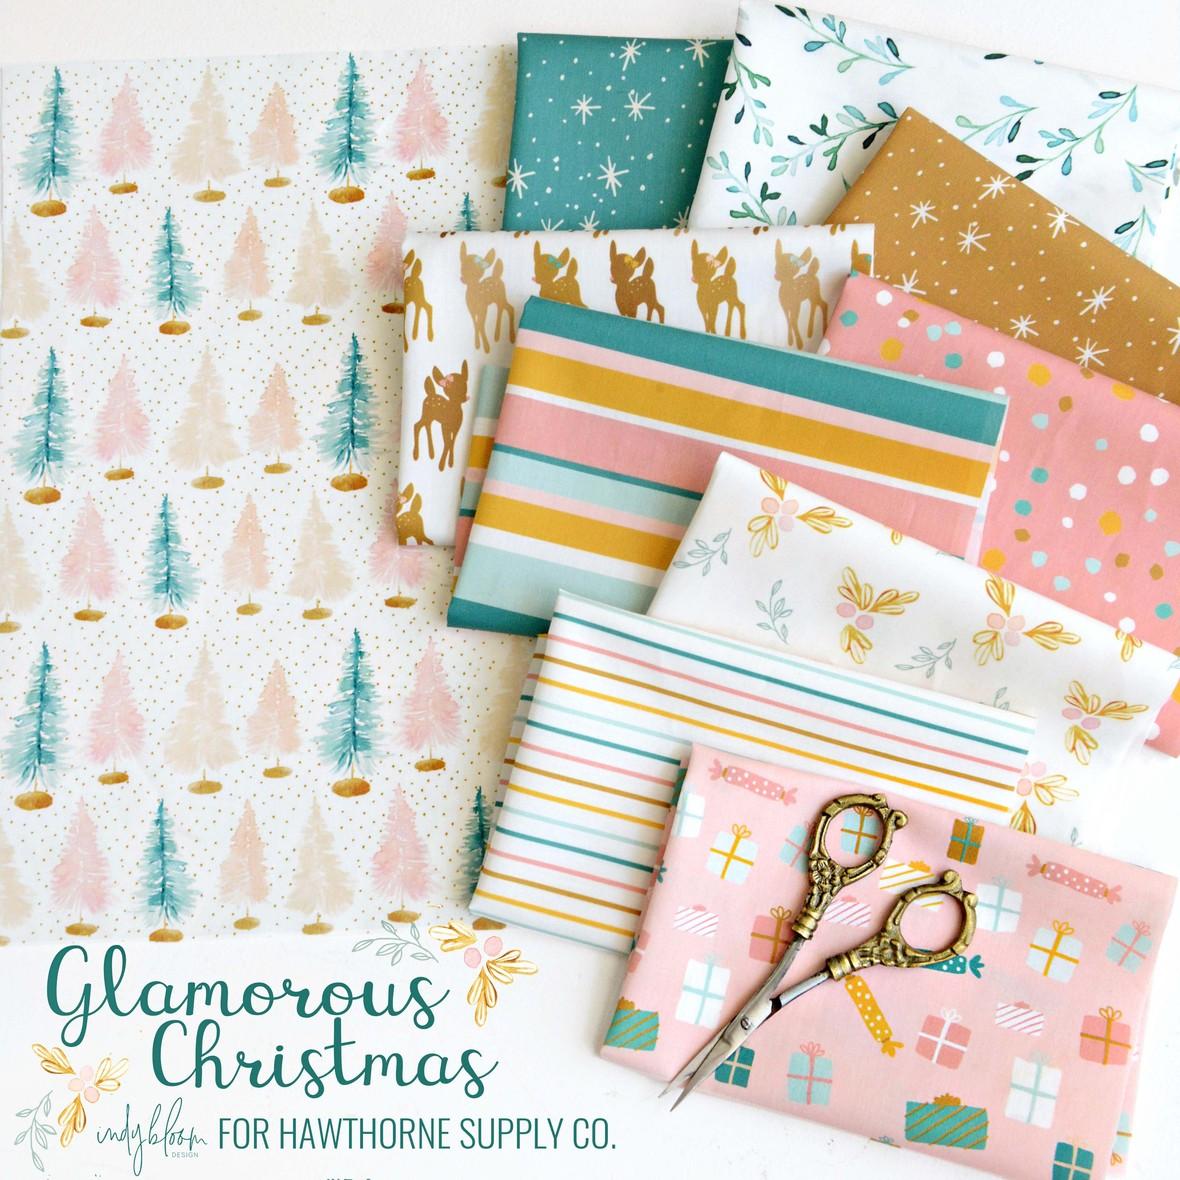 Glamorous Christmas Fabric Indy Bloom at Hawthorne Supply Cob